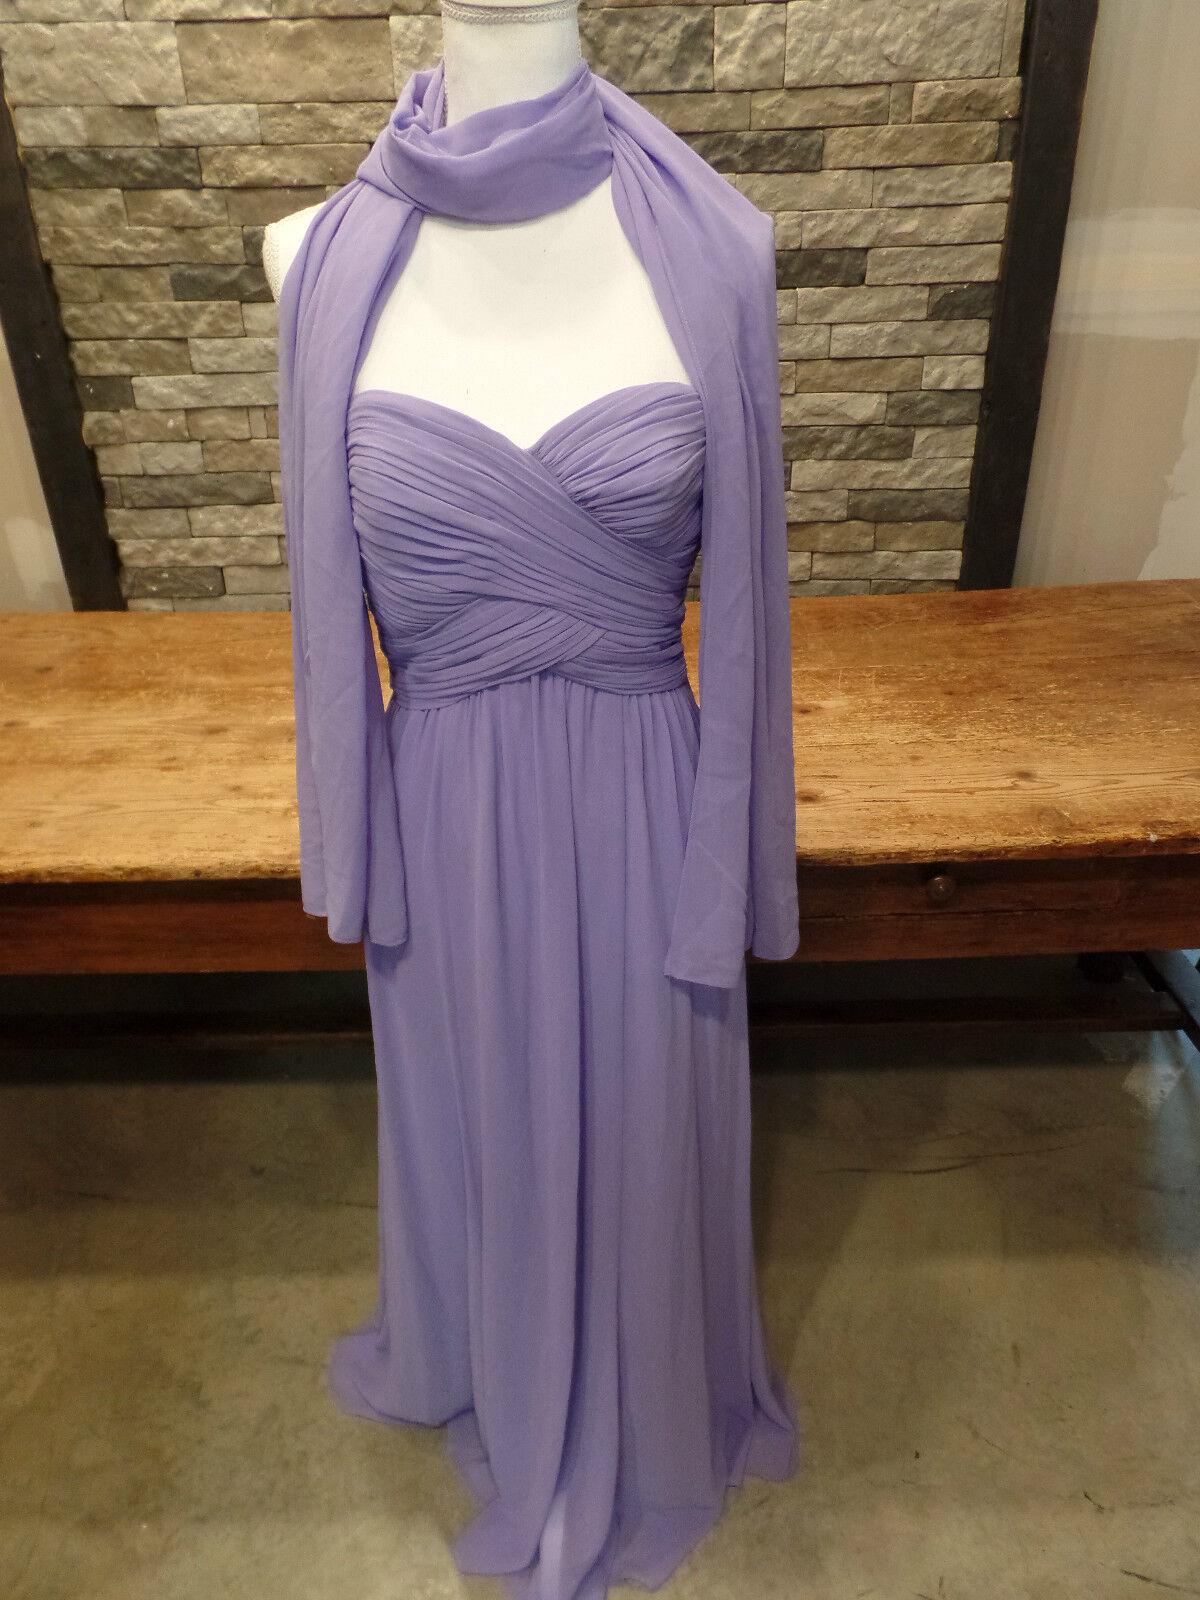 Ralph Lauren Dress Emmie Shawl Evening Prom Strapless purplec Size 4 NWT